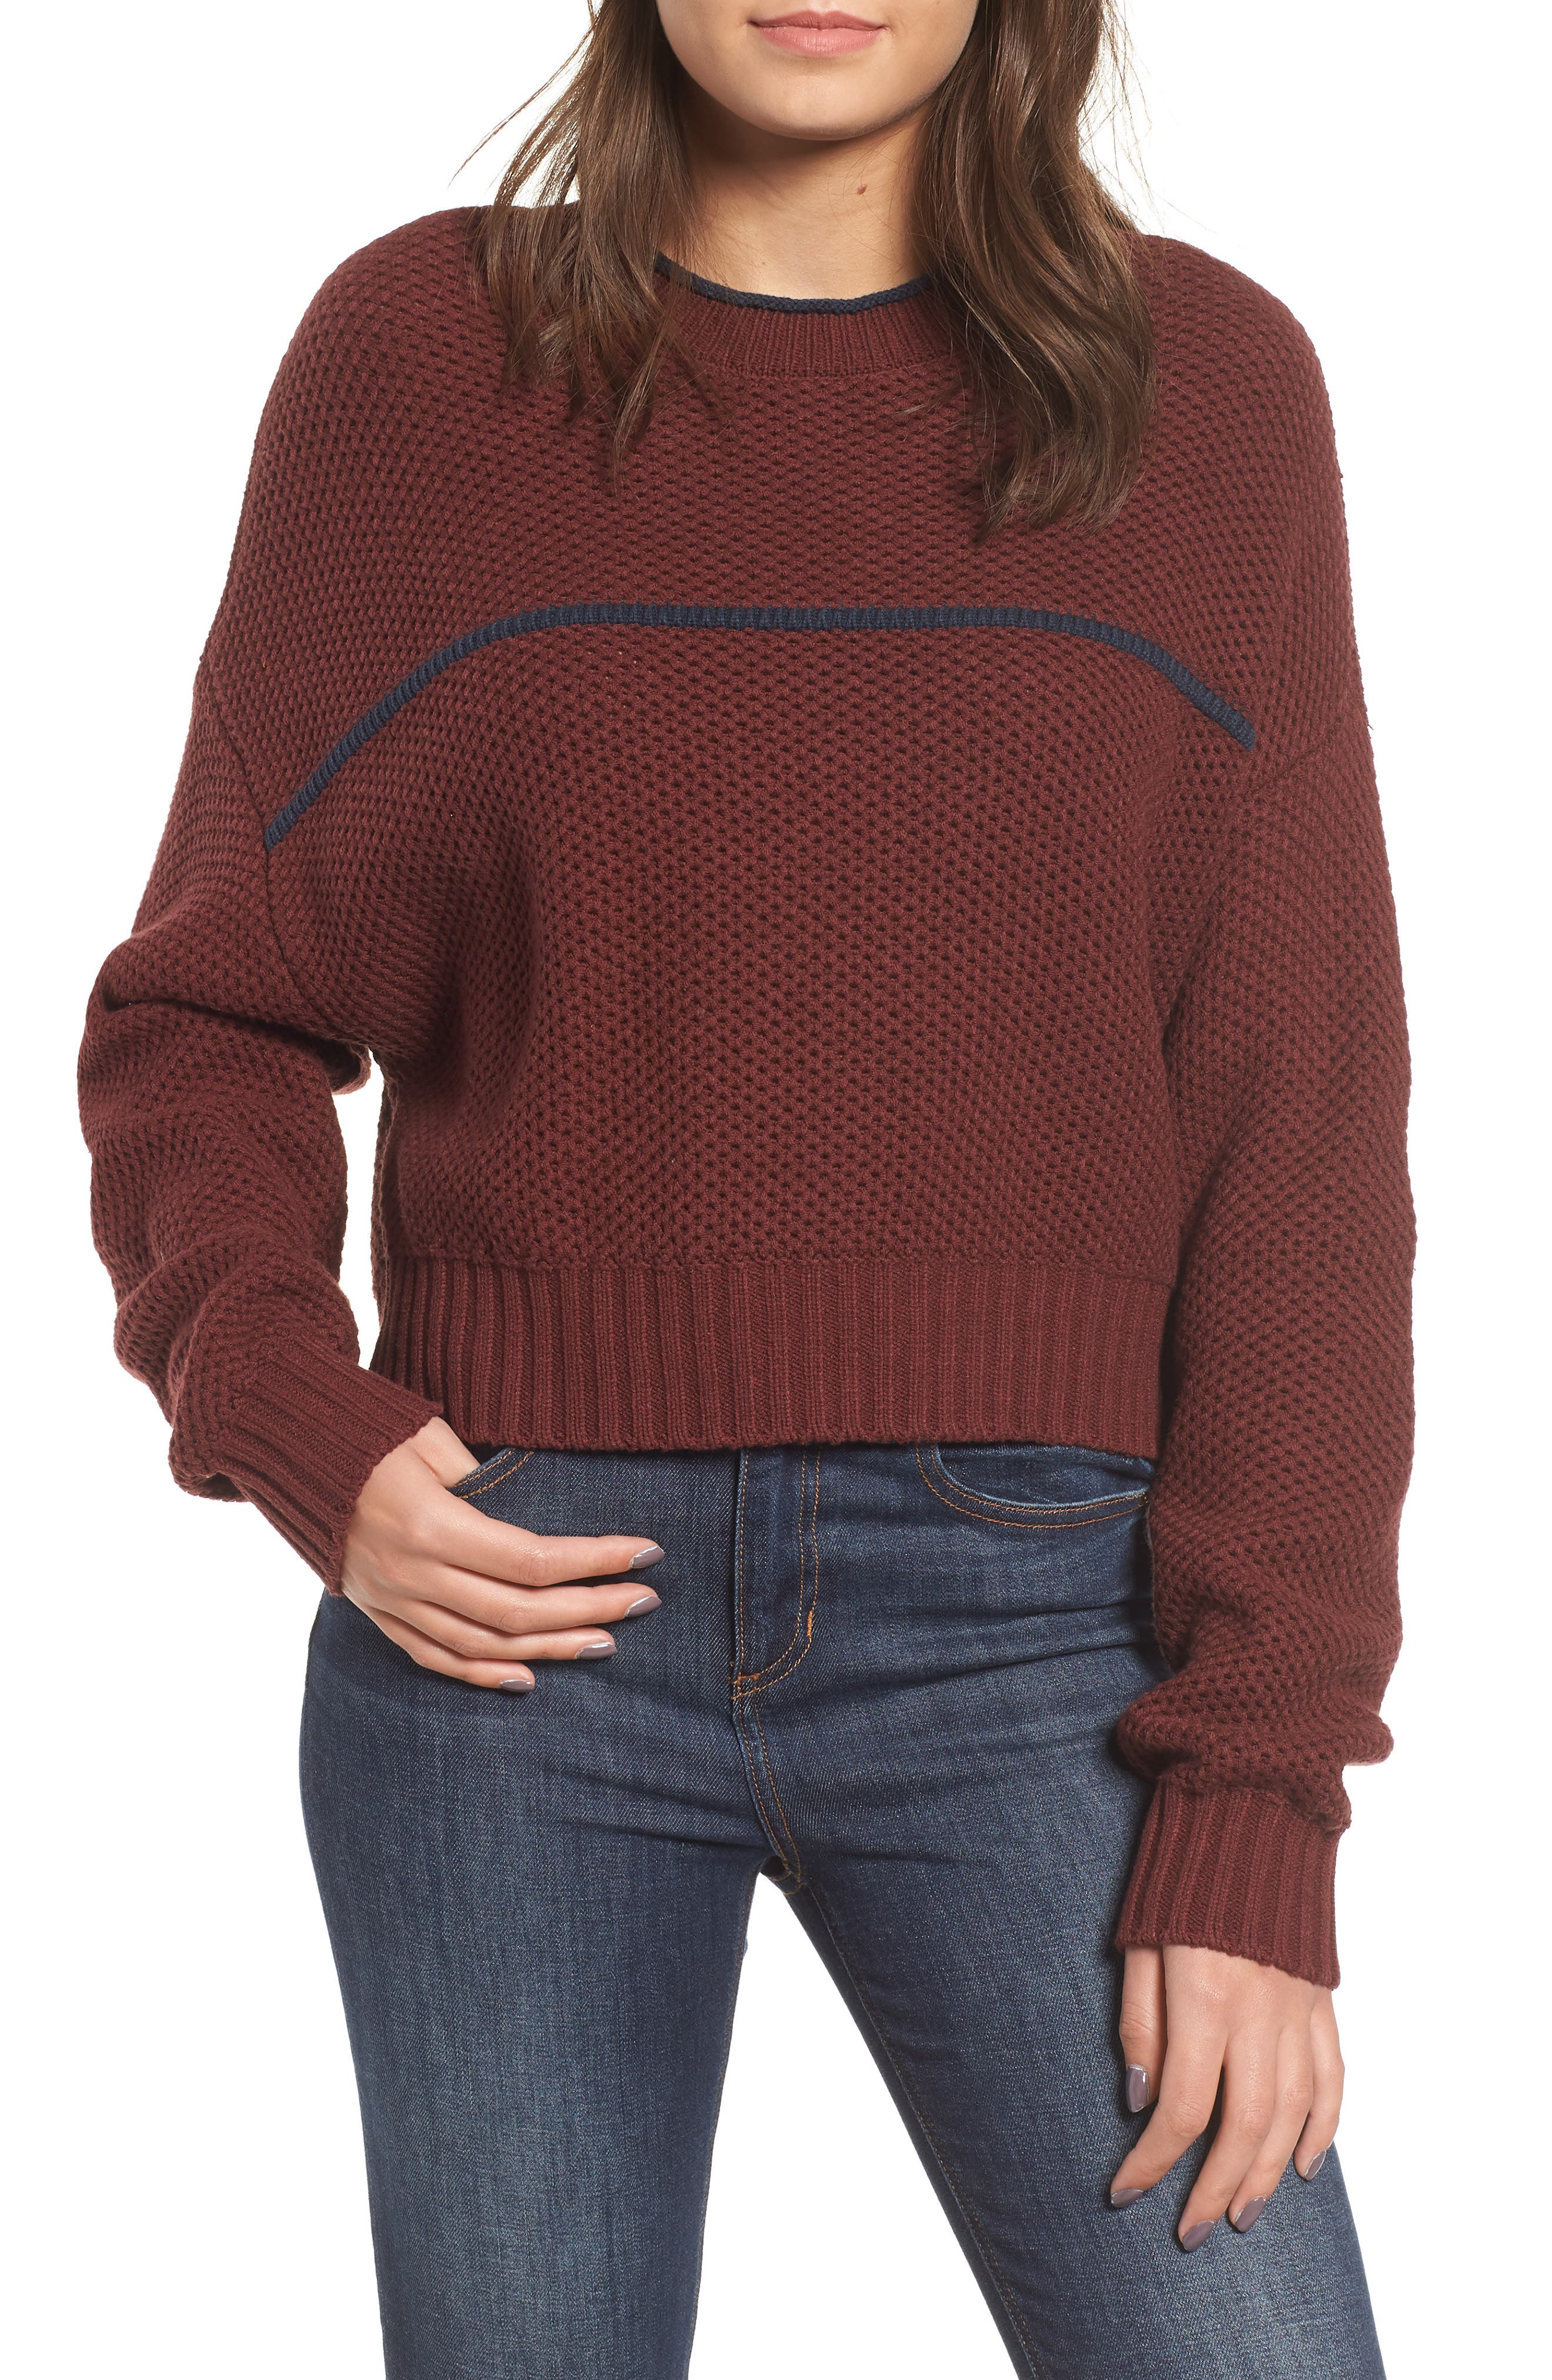 Rvca Jammer Seed Stitch Sweater, Burgundy